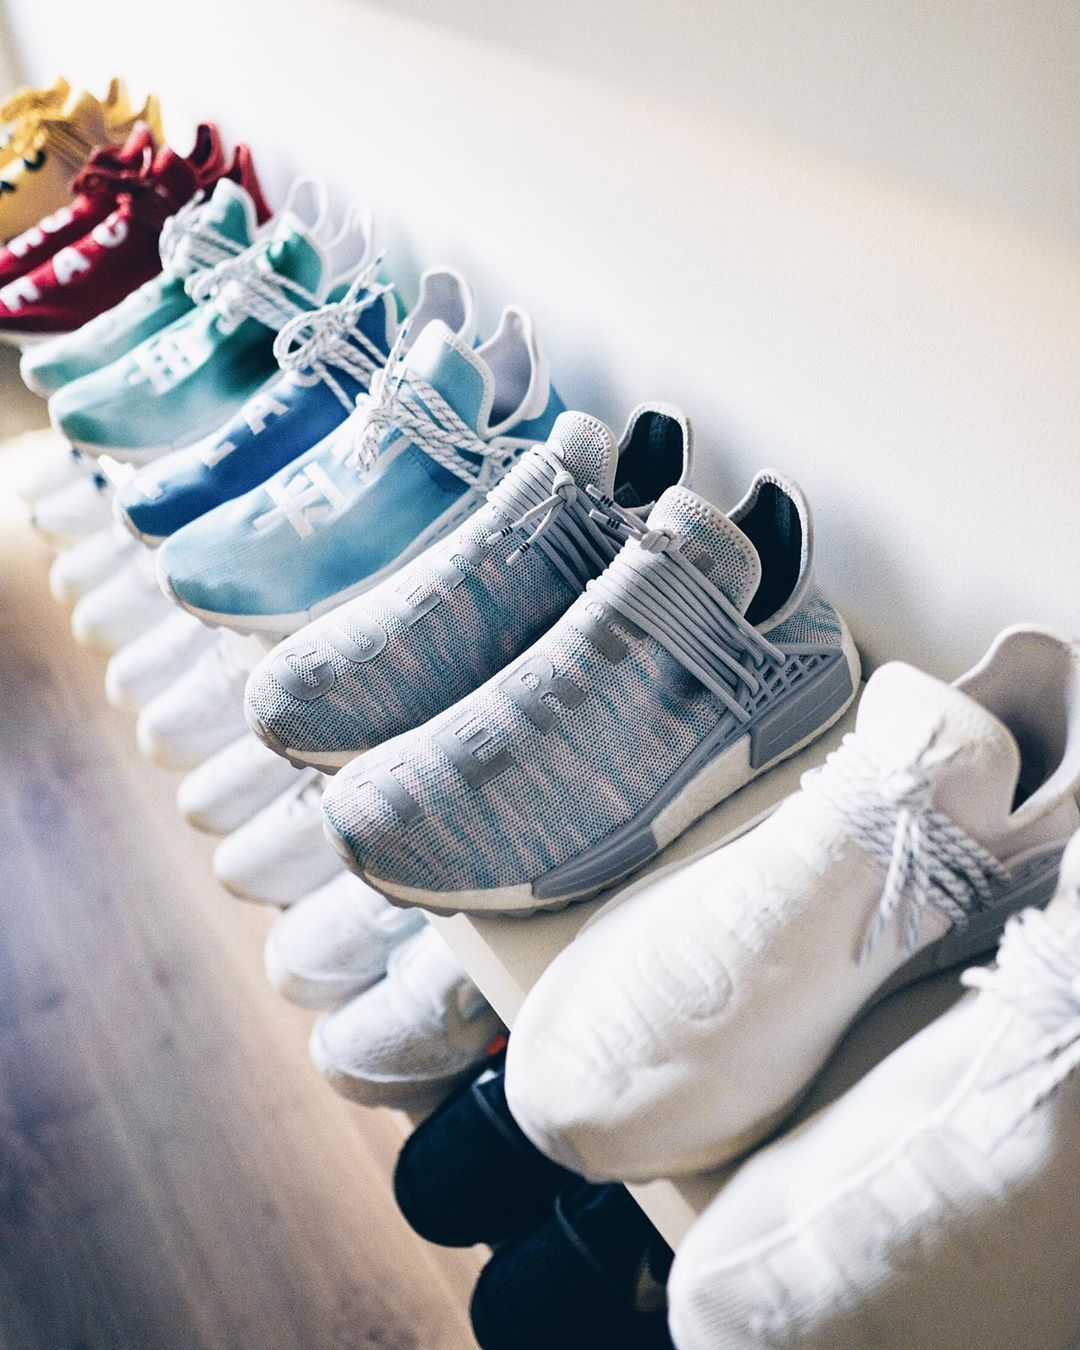 bbb5a6507 adidas Yeezy Boost 350 V2 - Solebox Preview   On Foot - EU Kicks  Sneaker  Magazine